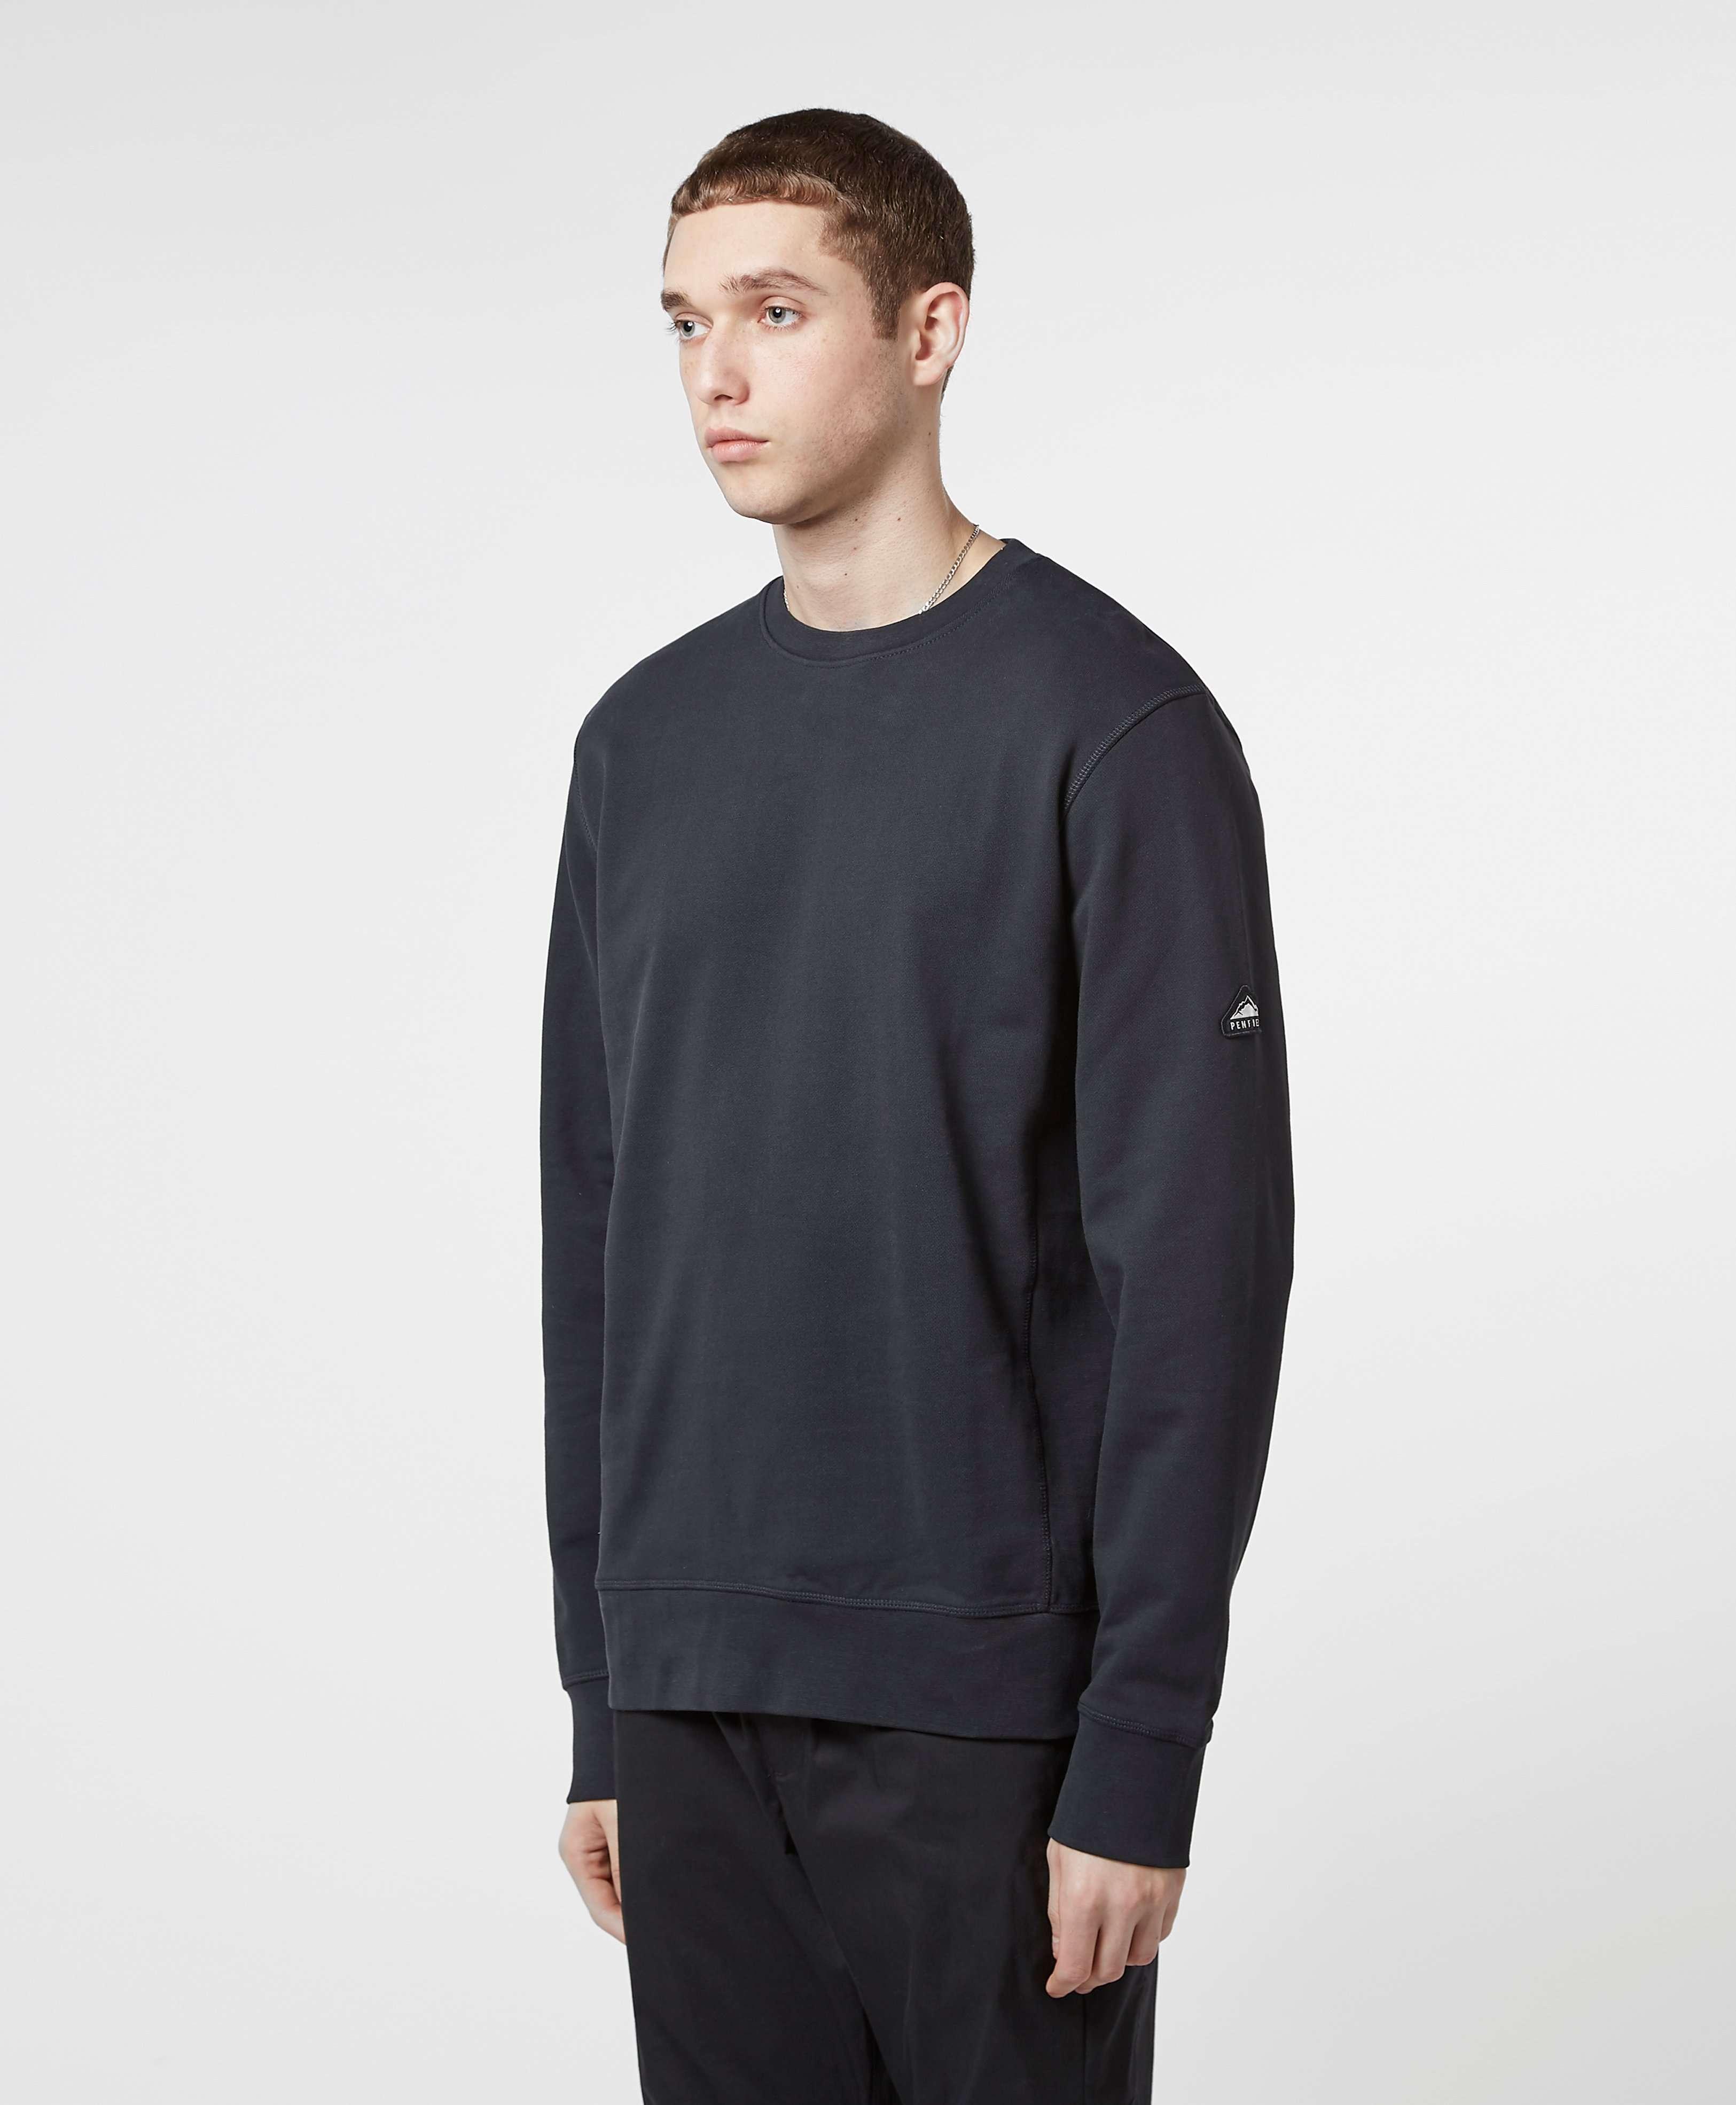 Penfield Eastlea Sweatshirt